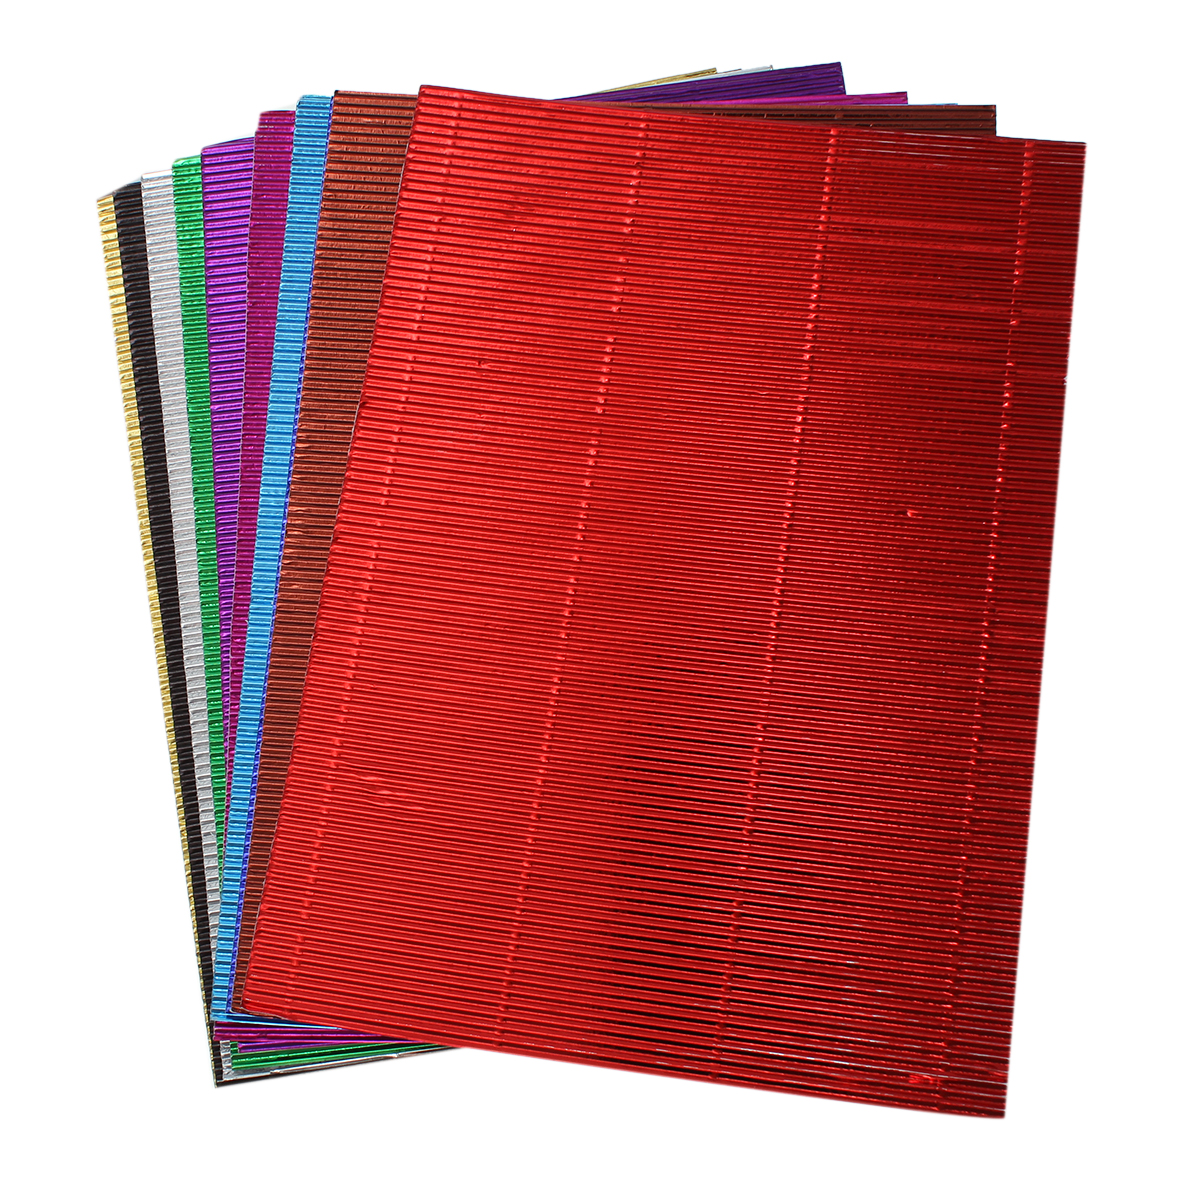 Scrapbook paper aliexpress - 10pcs Multicolor Corrugated Paper Fold Scrapbooking Paper Craft Kid Diy Artwork Materials Home Decor 30 X21cm